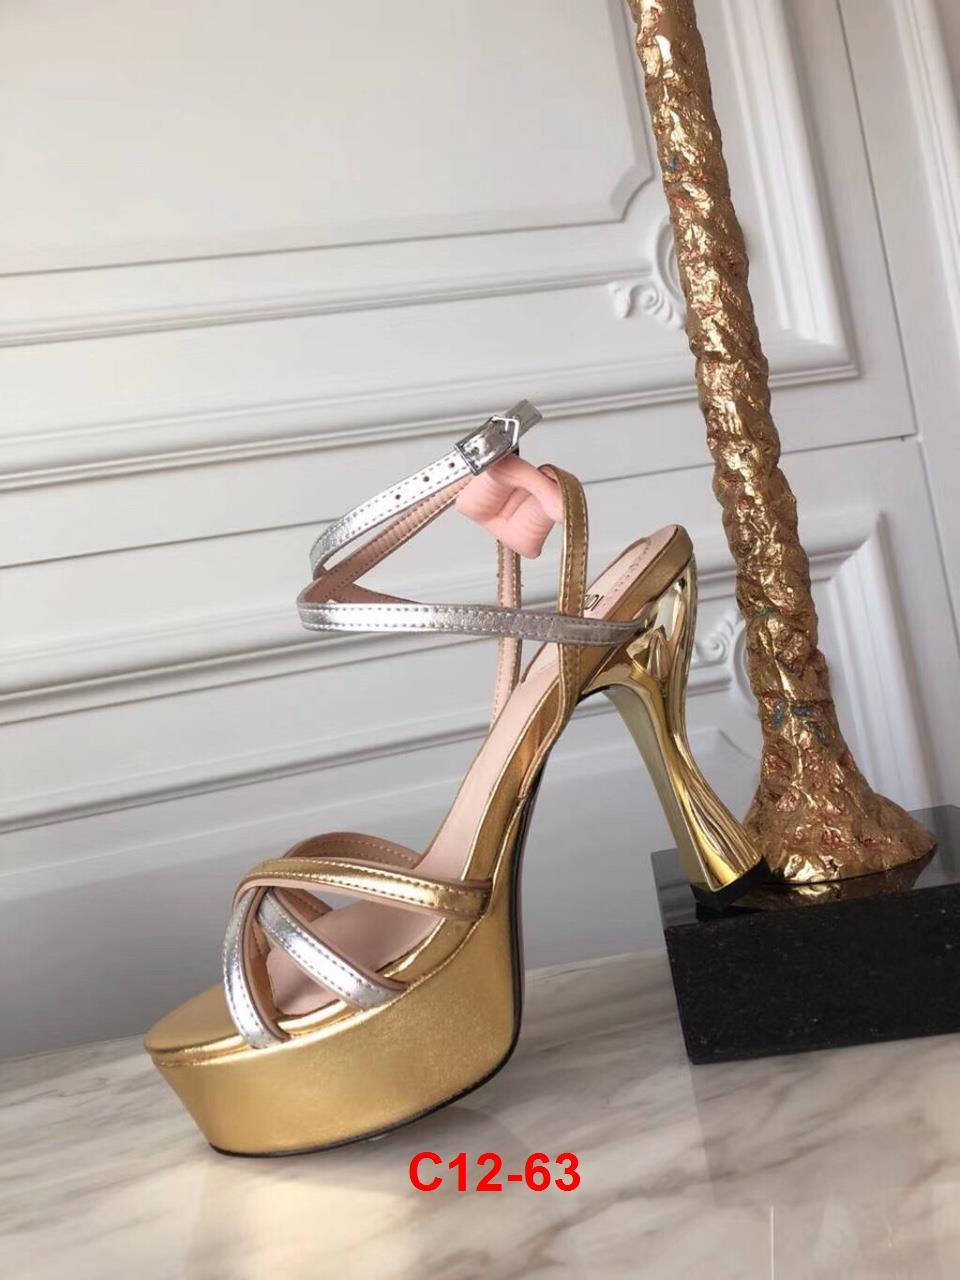 C12-63 Fendi sandal cao 10cm đế kếp siêu cấp